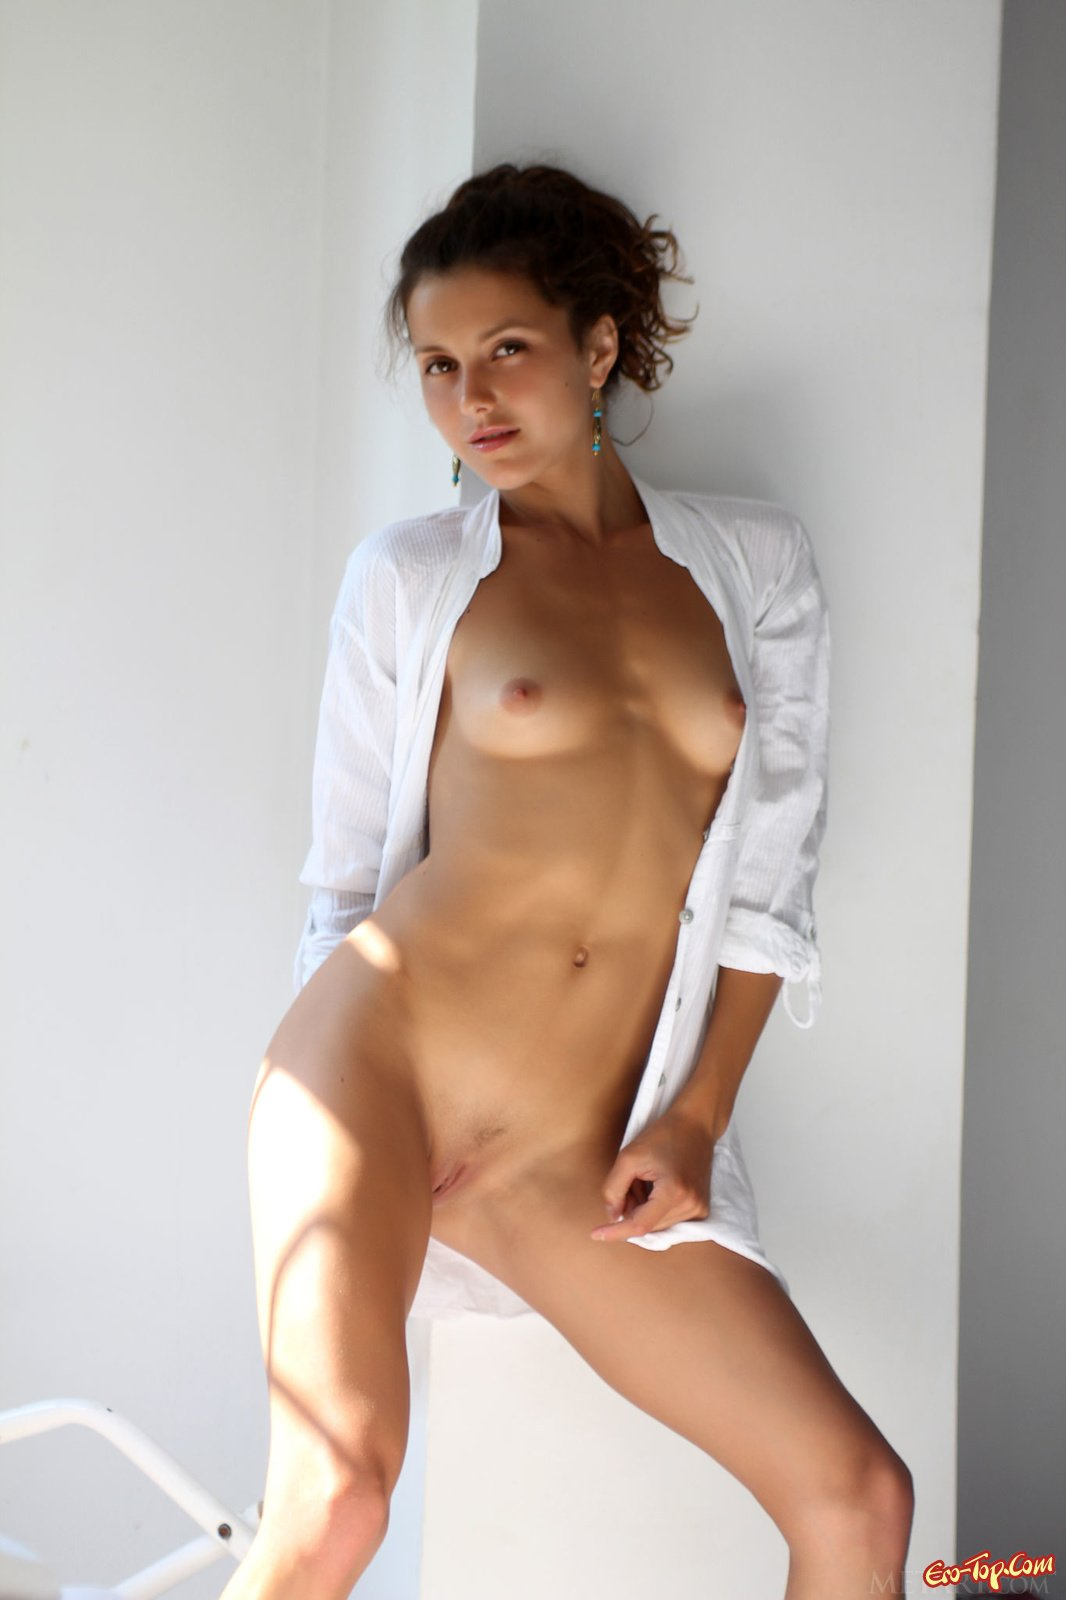 Divina A в белоснежной рубашке